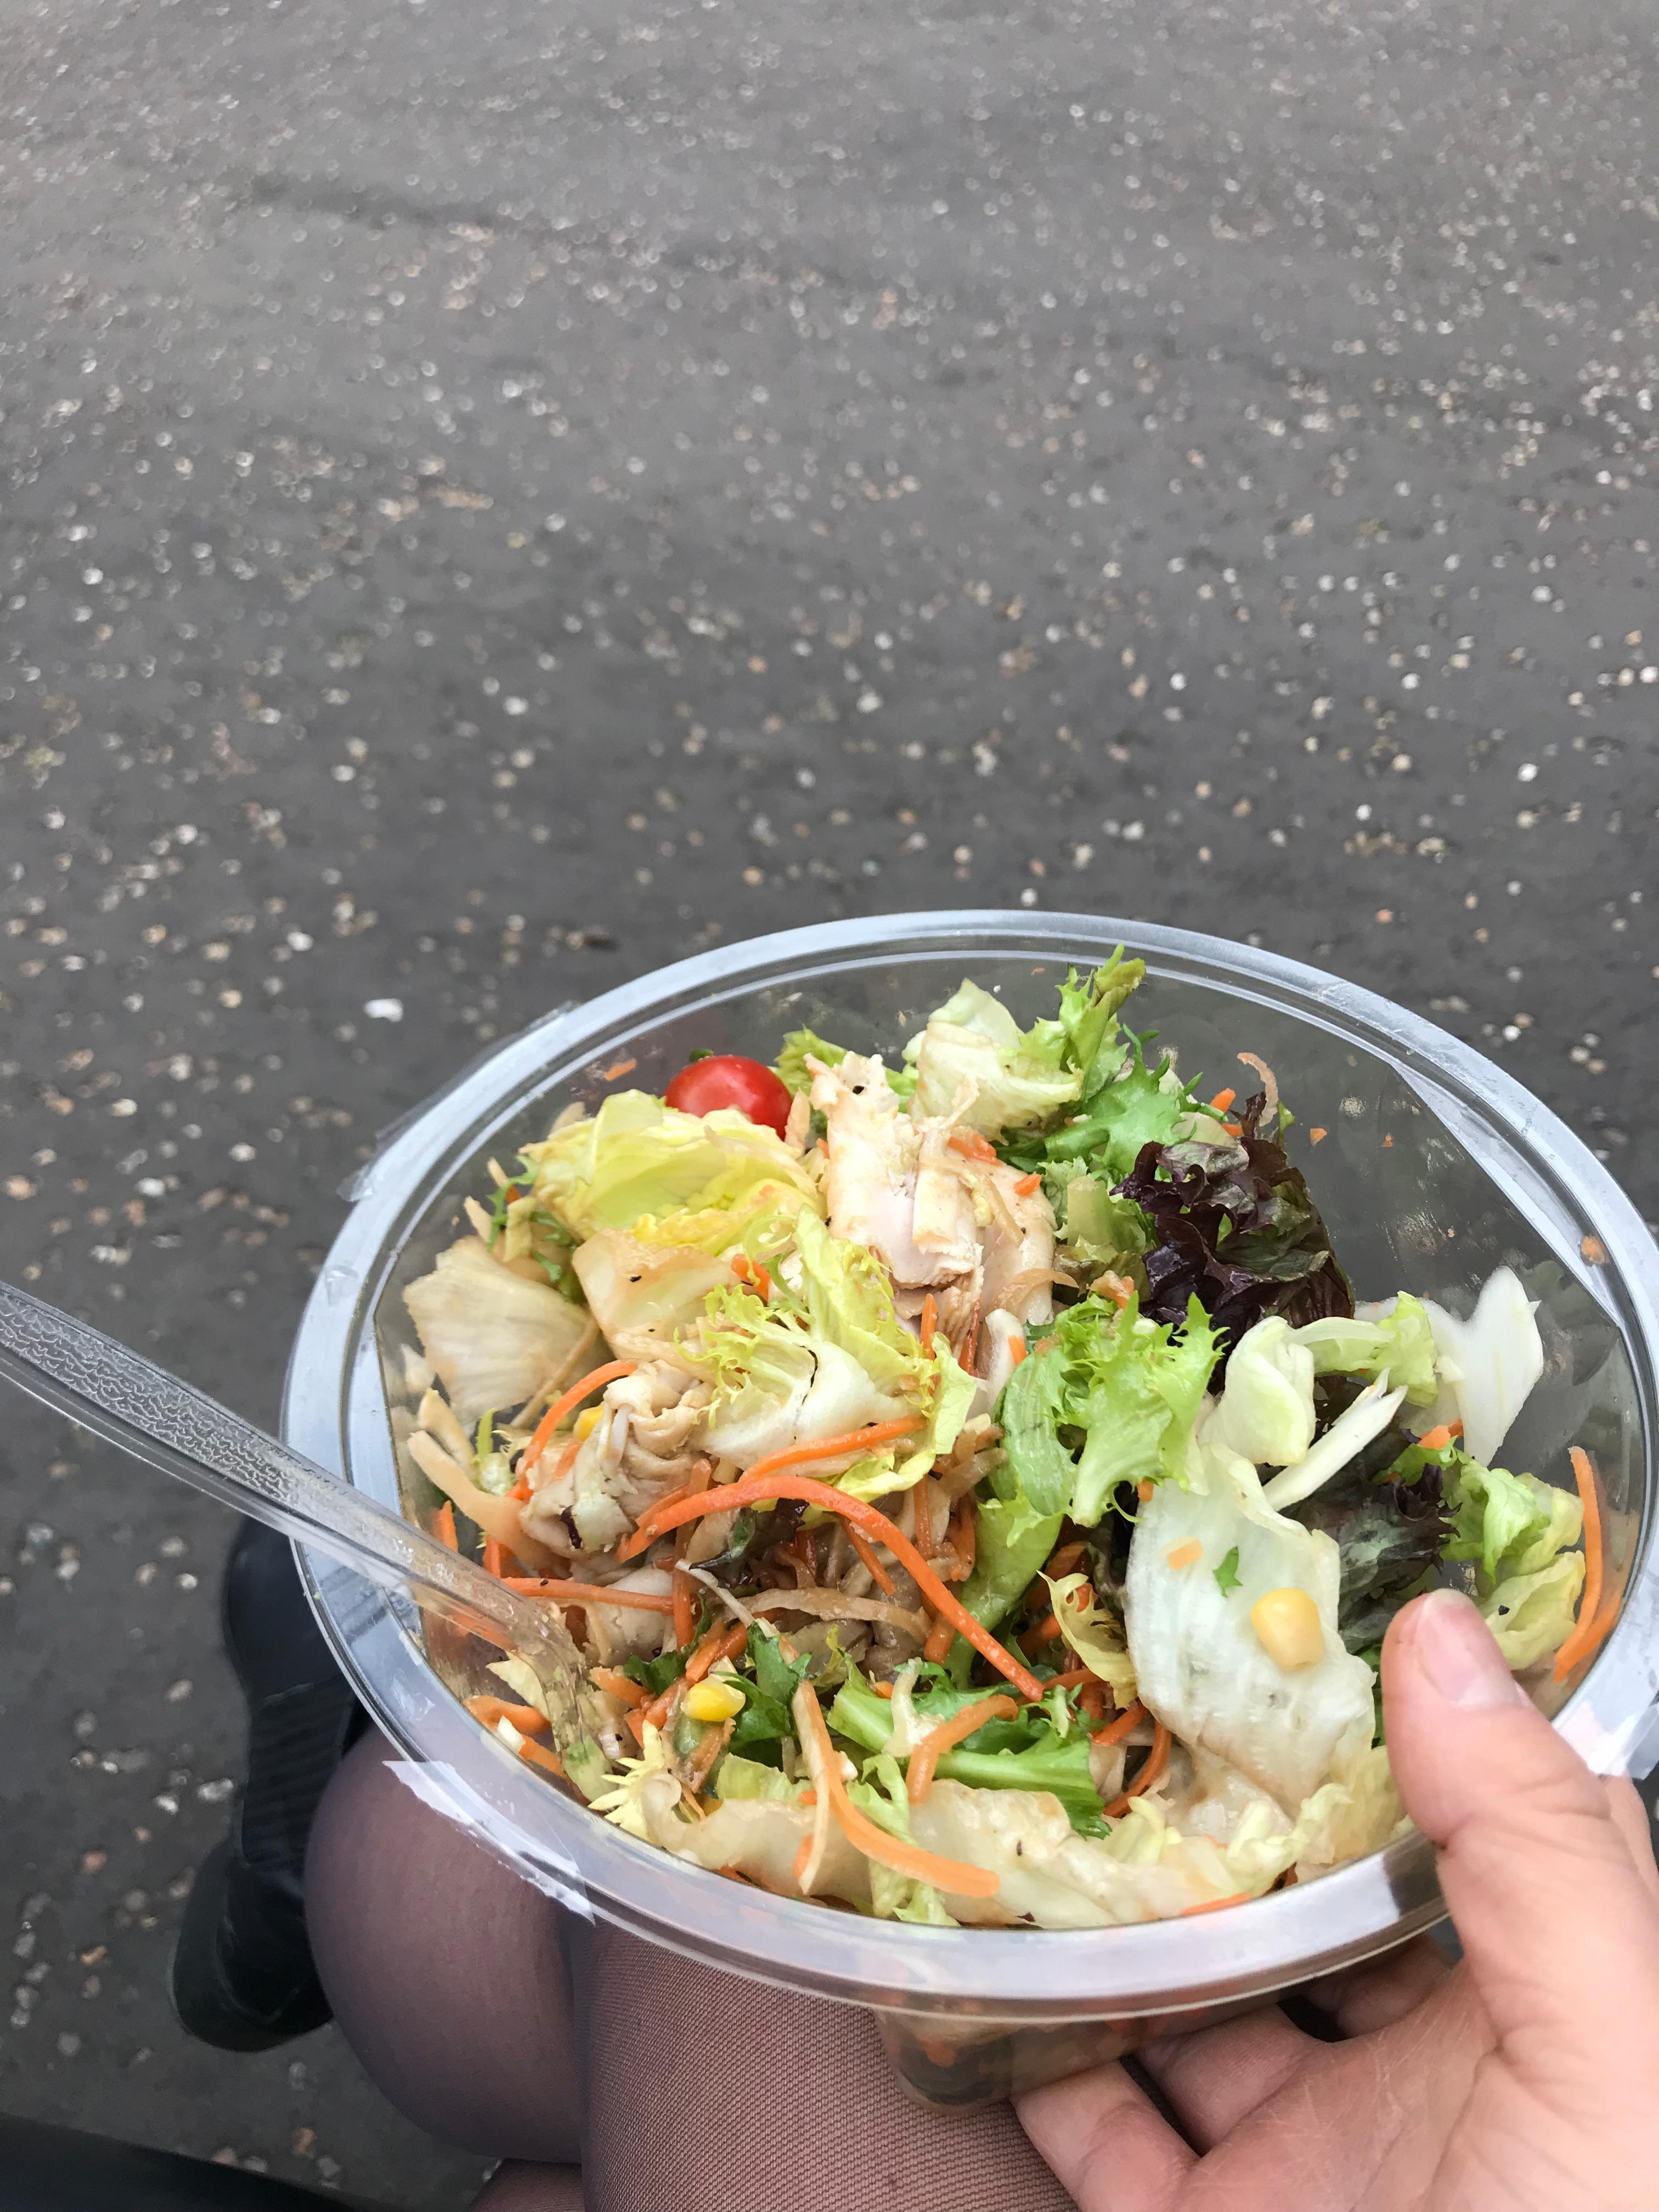 CAPAStudyAbroad_London_Spring2018_From Ellie Telander - Packed lunch